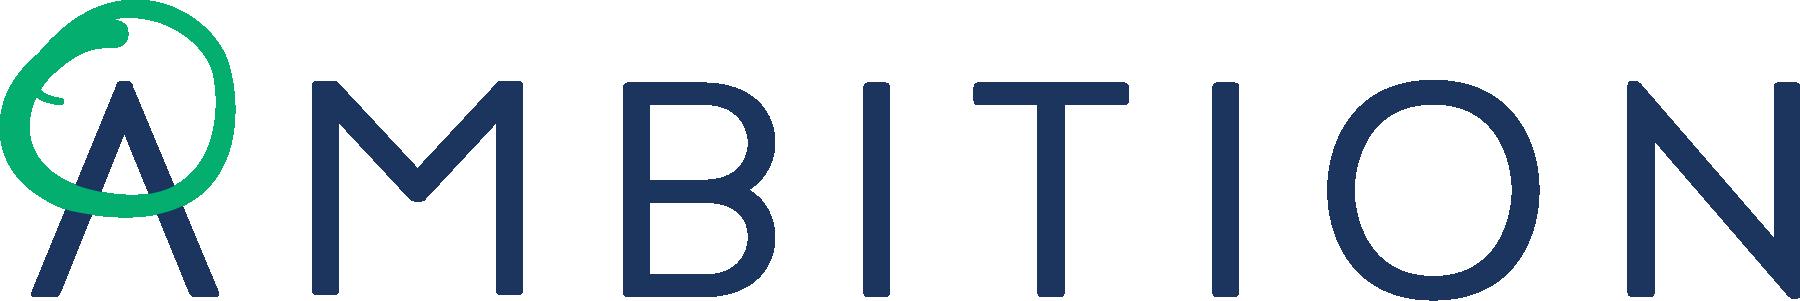 Primary Logo (Navy_Green) (1)